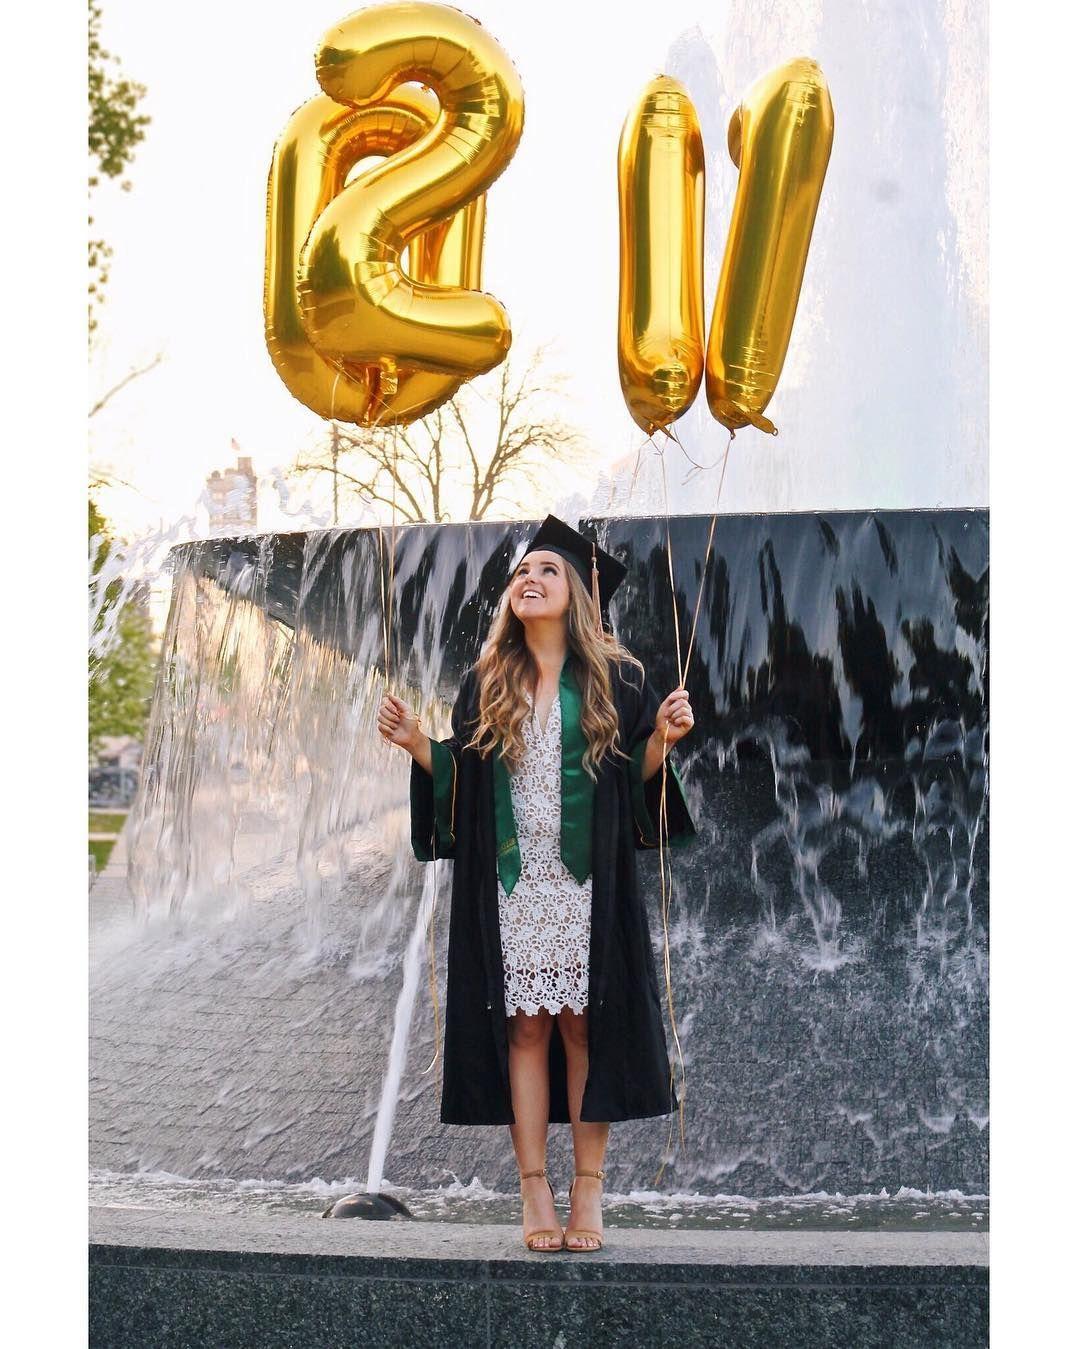 baylor graduation photo idea use number balloons to show of your baylor graduation photo idea use number balloons to show of your grad year